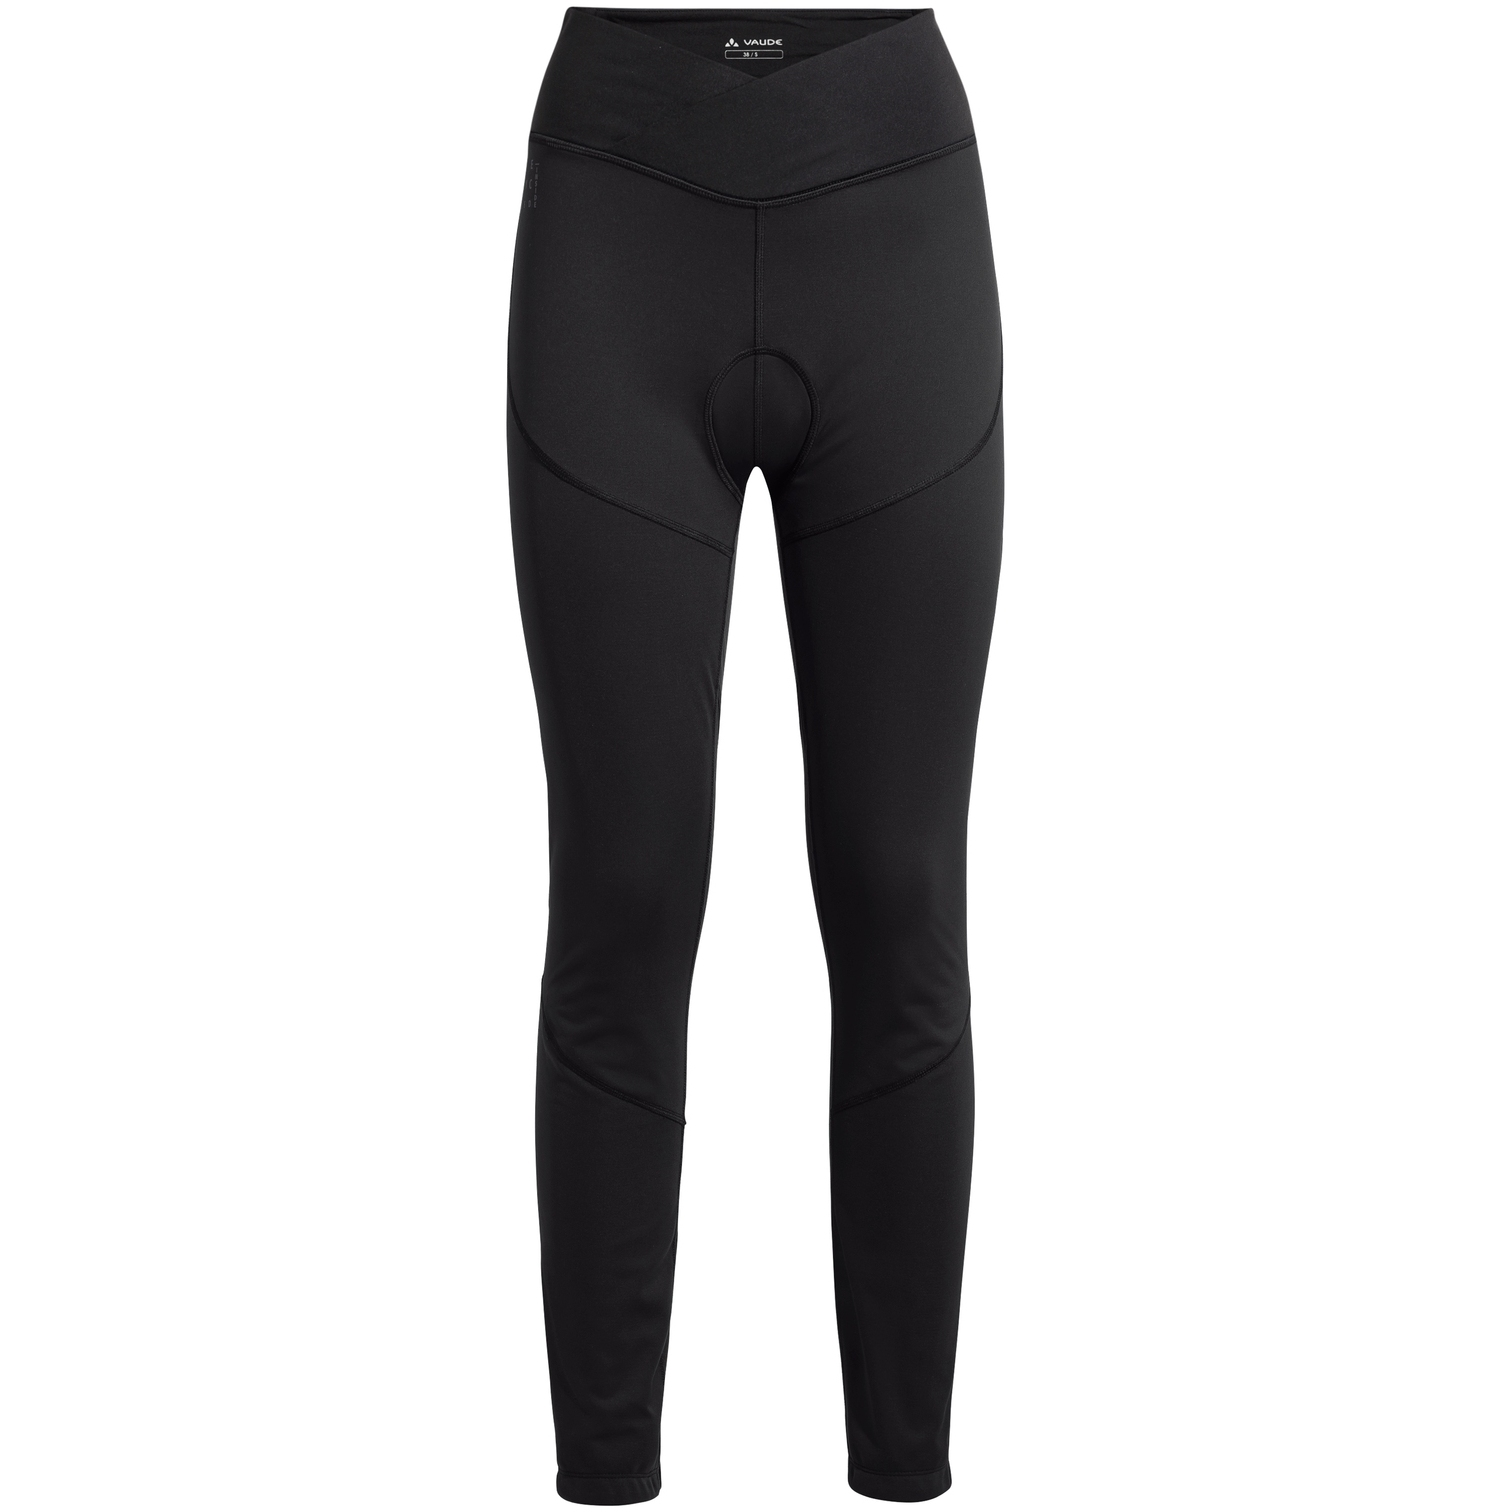 Vaude Women's Posta Warm Tights - black